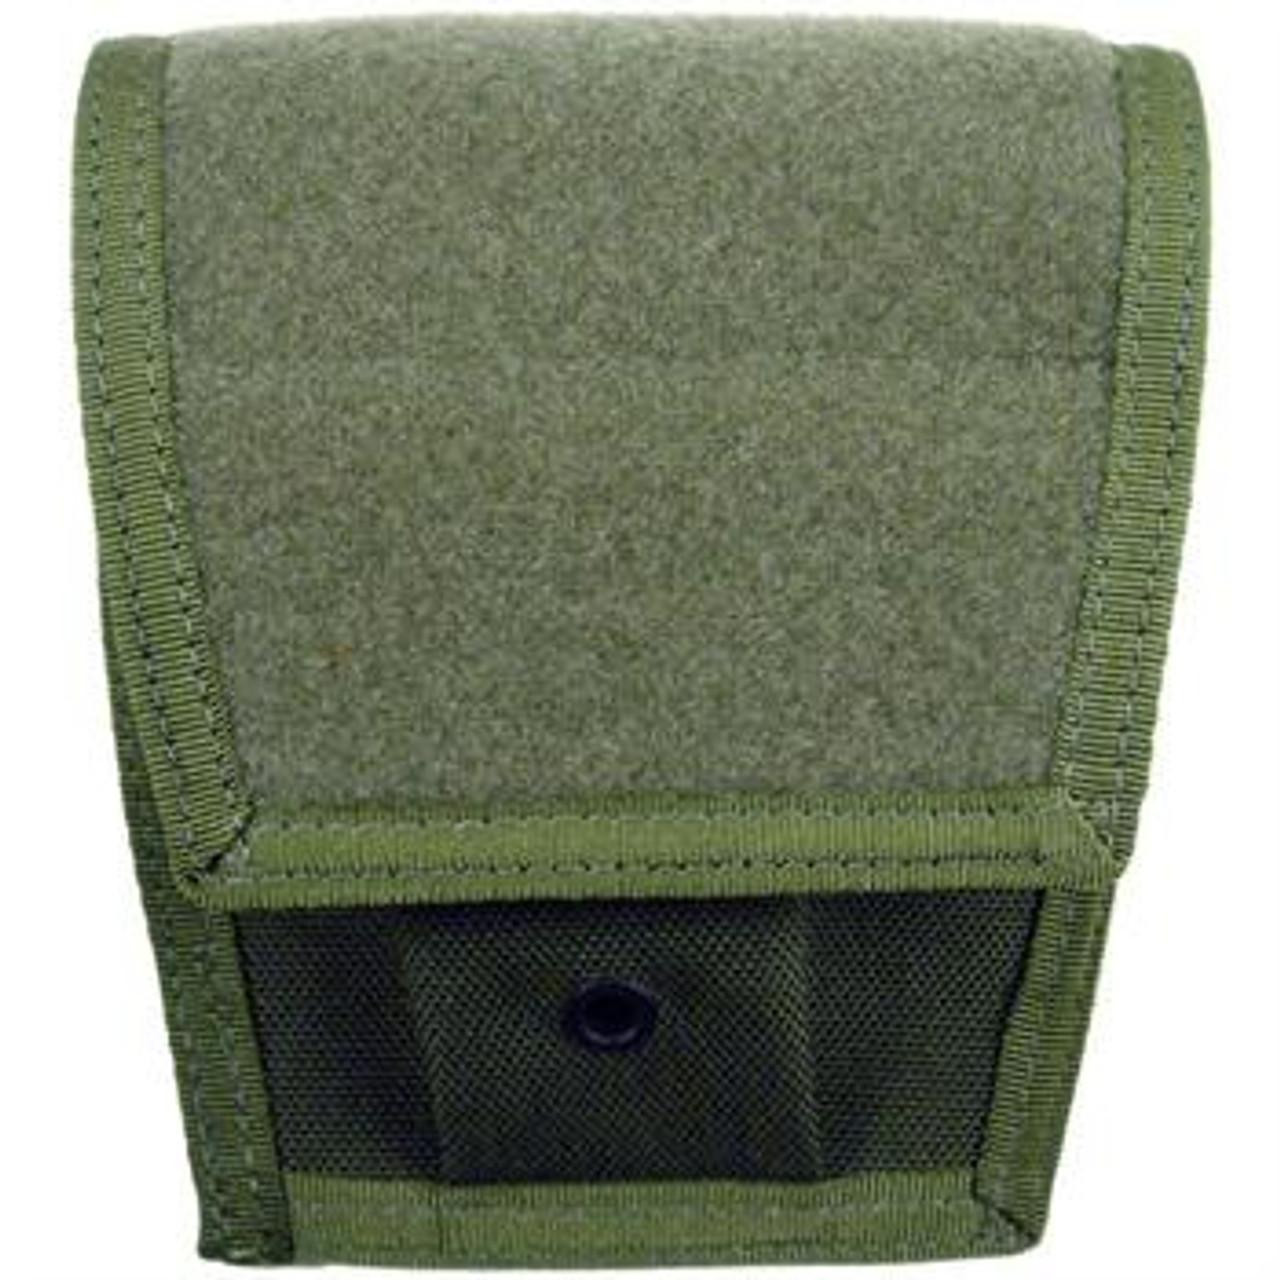 Maxpedition Double Handcuff Pouch  Color  Green